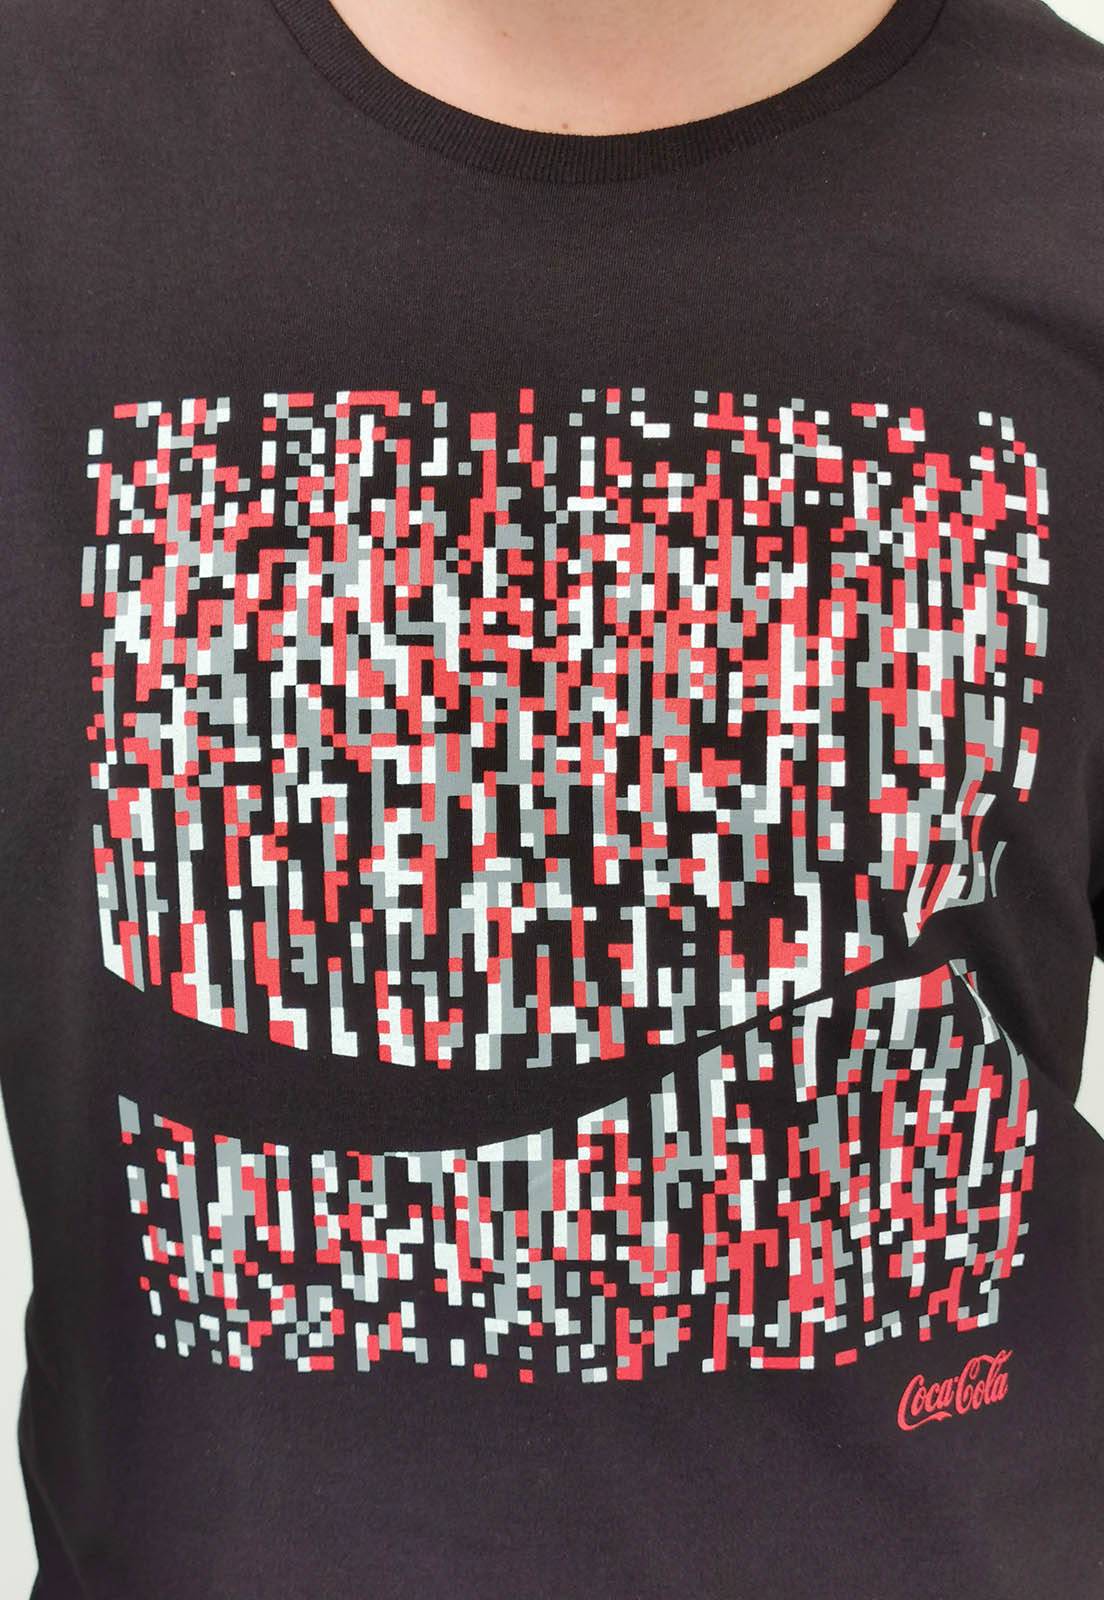 Camiseta Coca-Cola Preto Mosaico